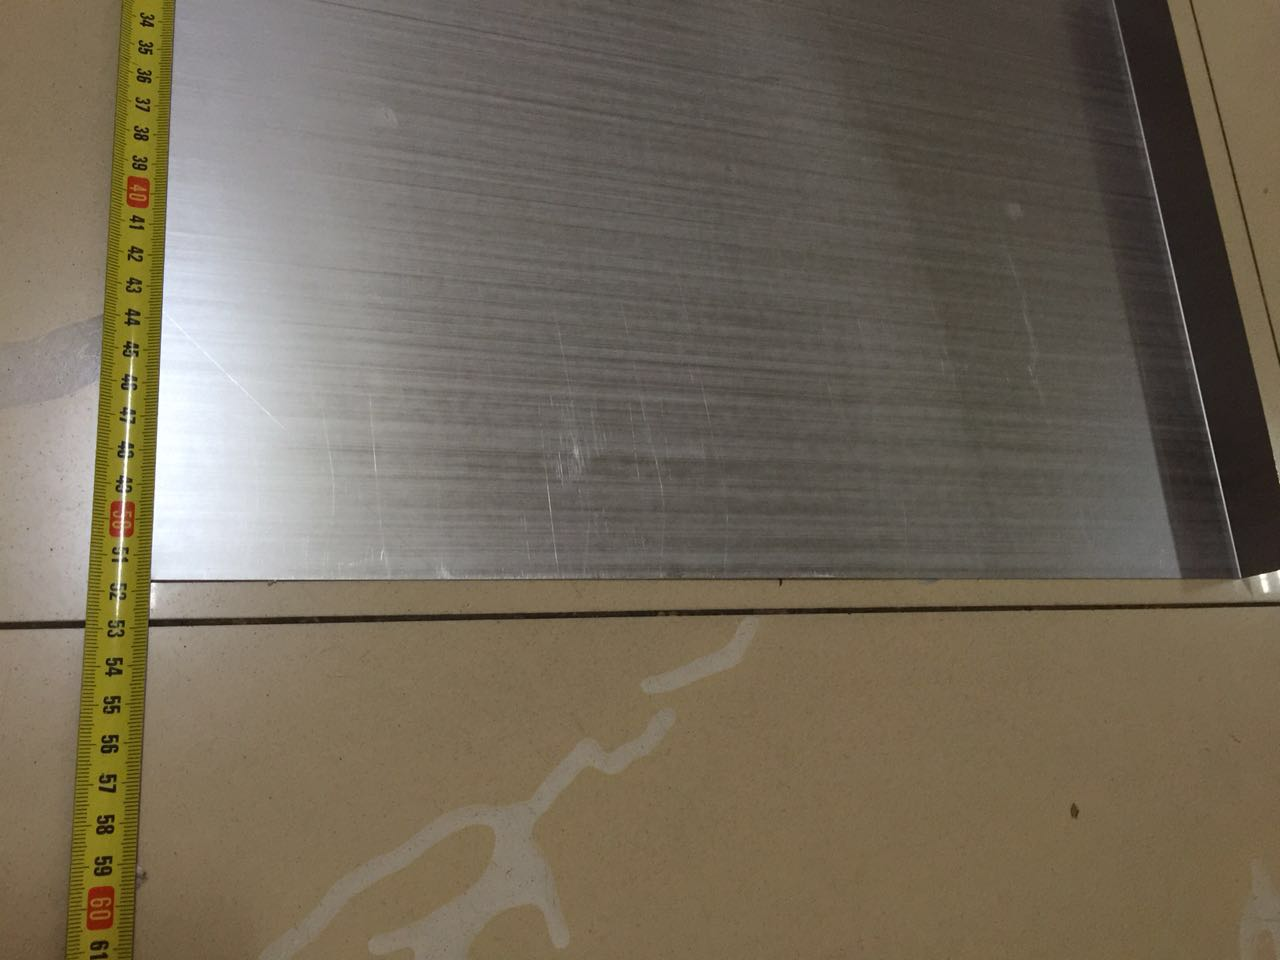 Varible cilinder jassen voor printer/Indruk Cilinder Jas/69.731.080N GTO52 Cilinder jas